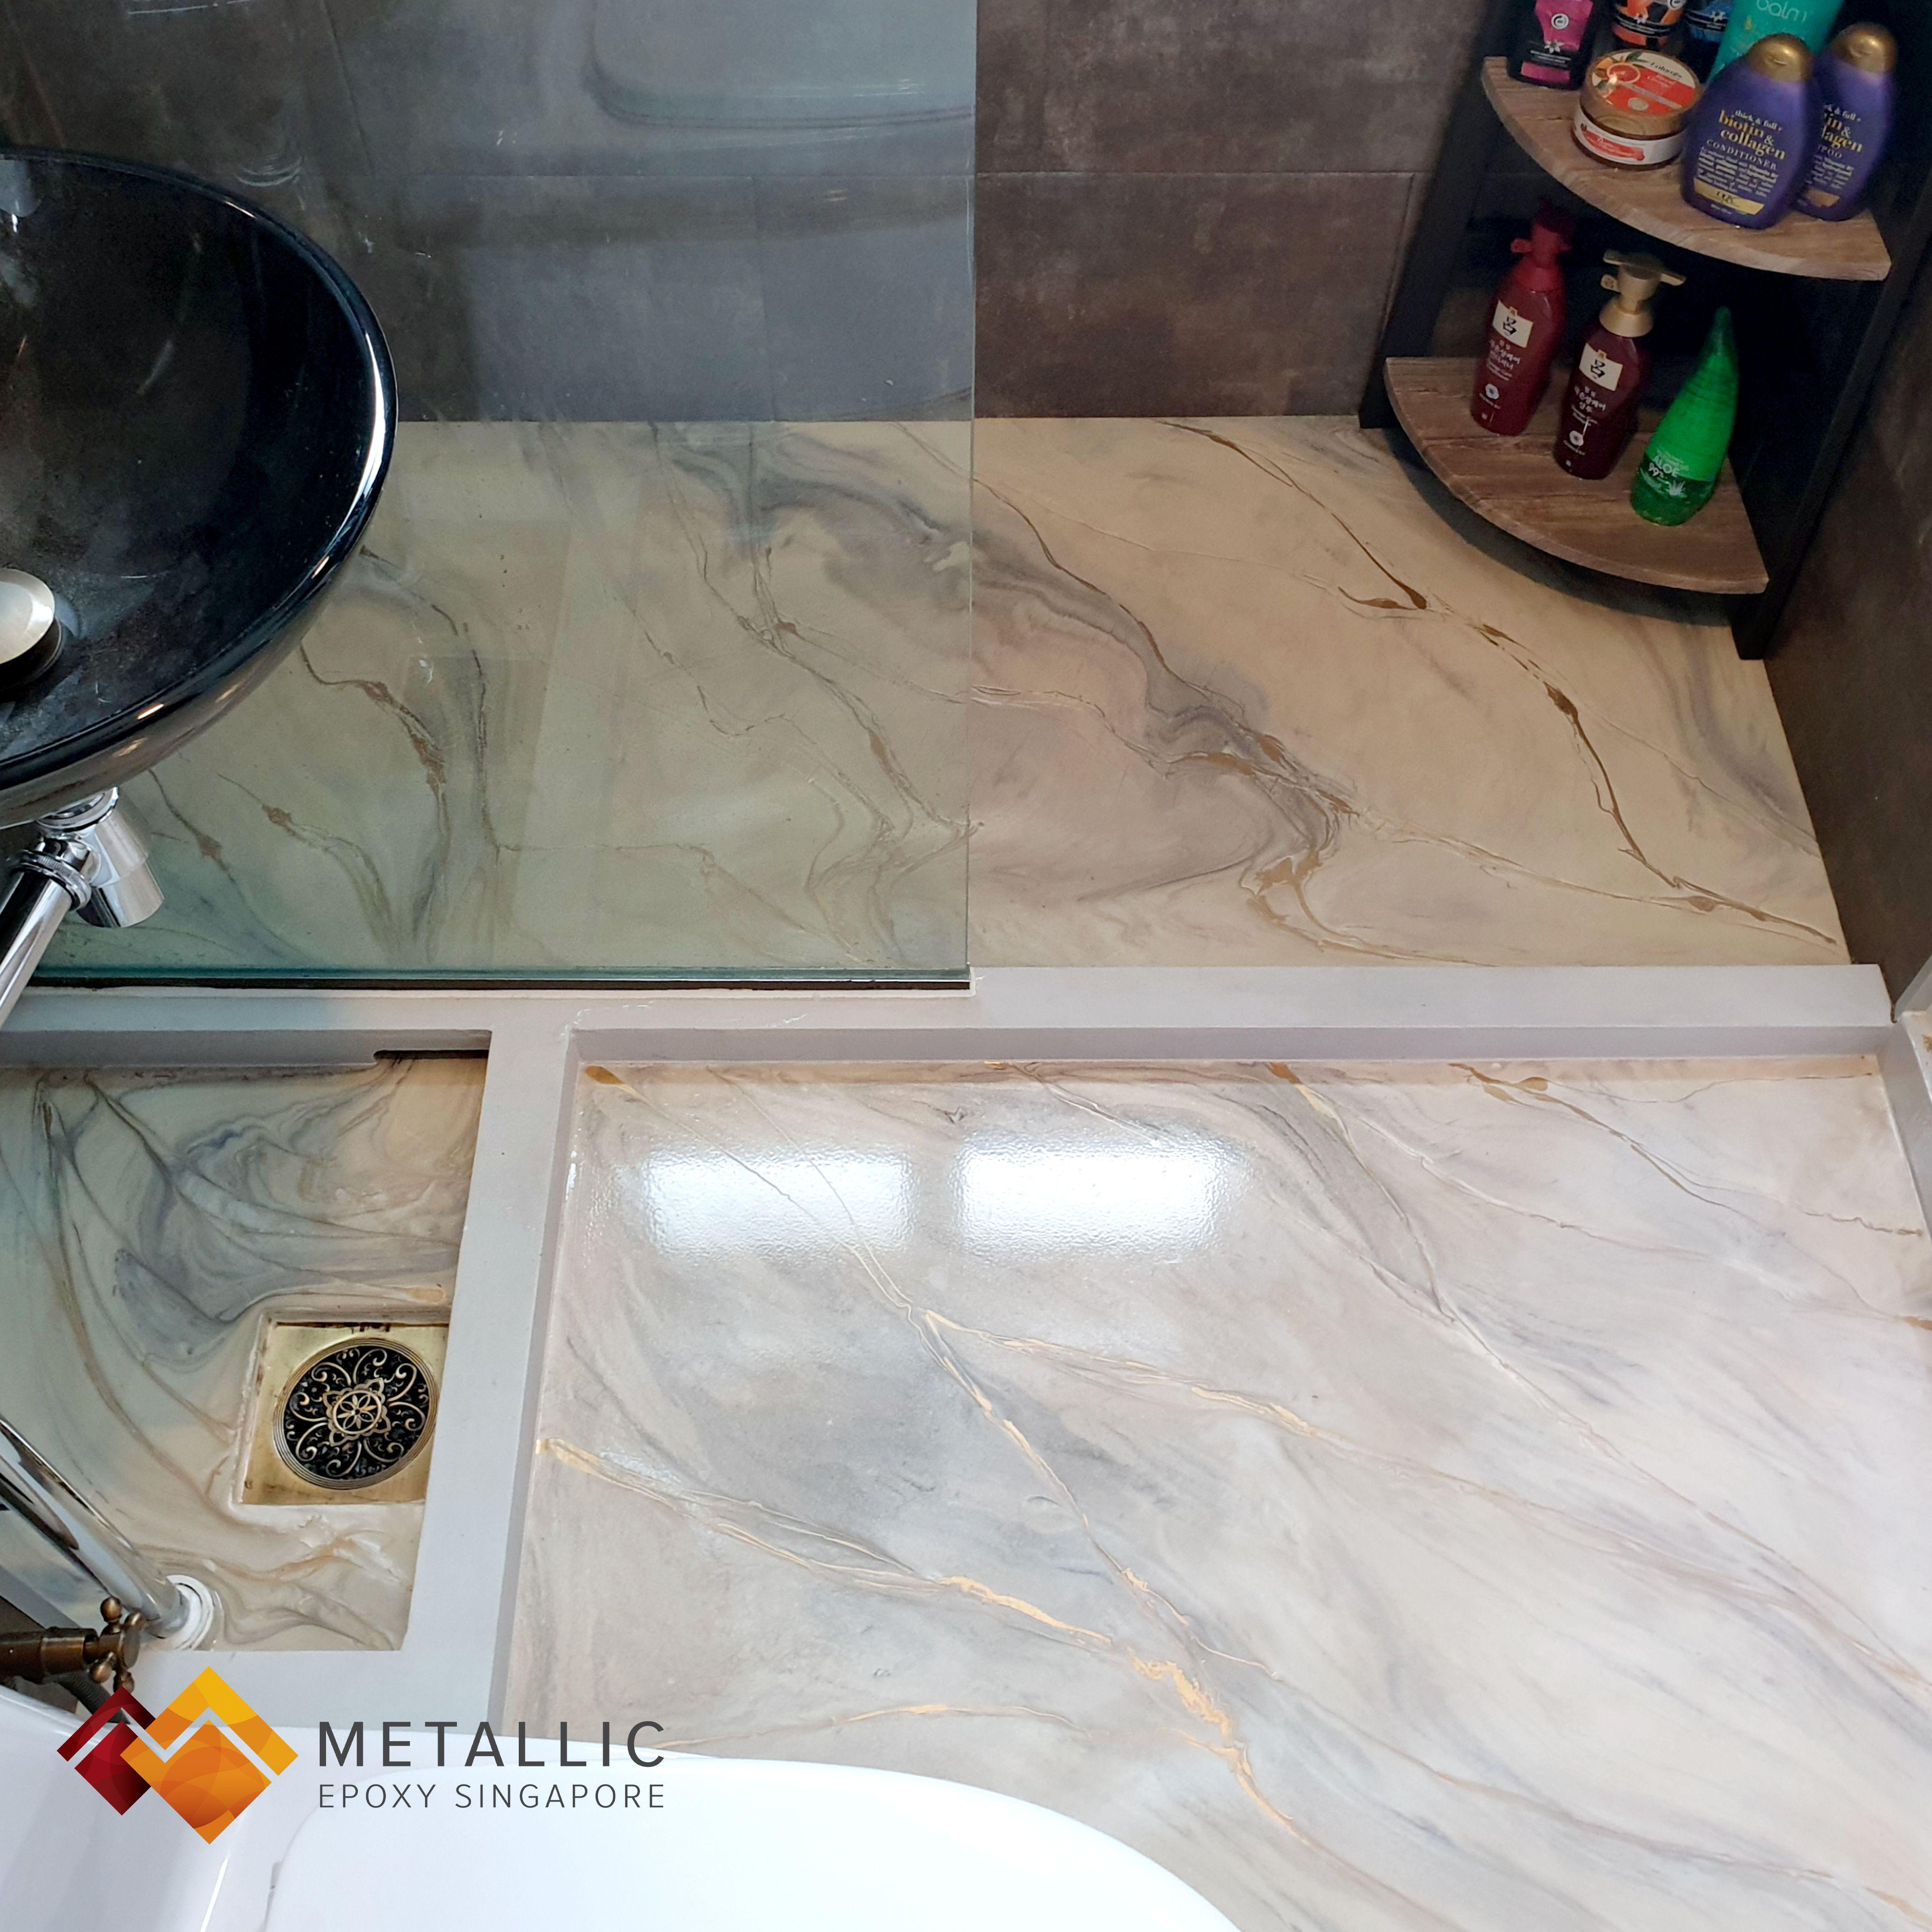 Metallic Epoxy Singapore Coffee Gold Highlights On Light Brown Base Bathroom Floor Bathroom Flooring Gold Highlights Buying Flooring